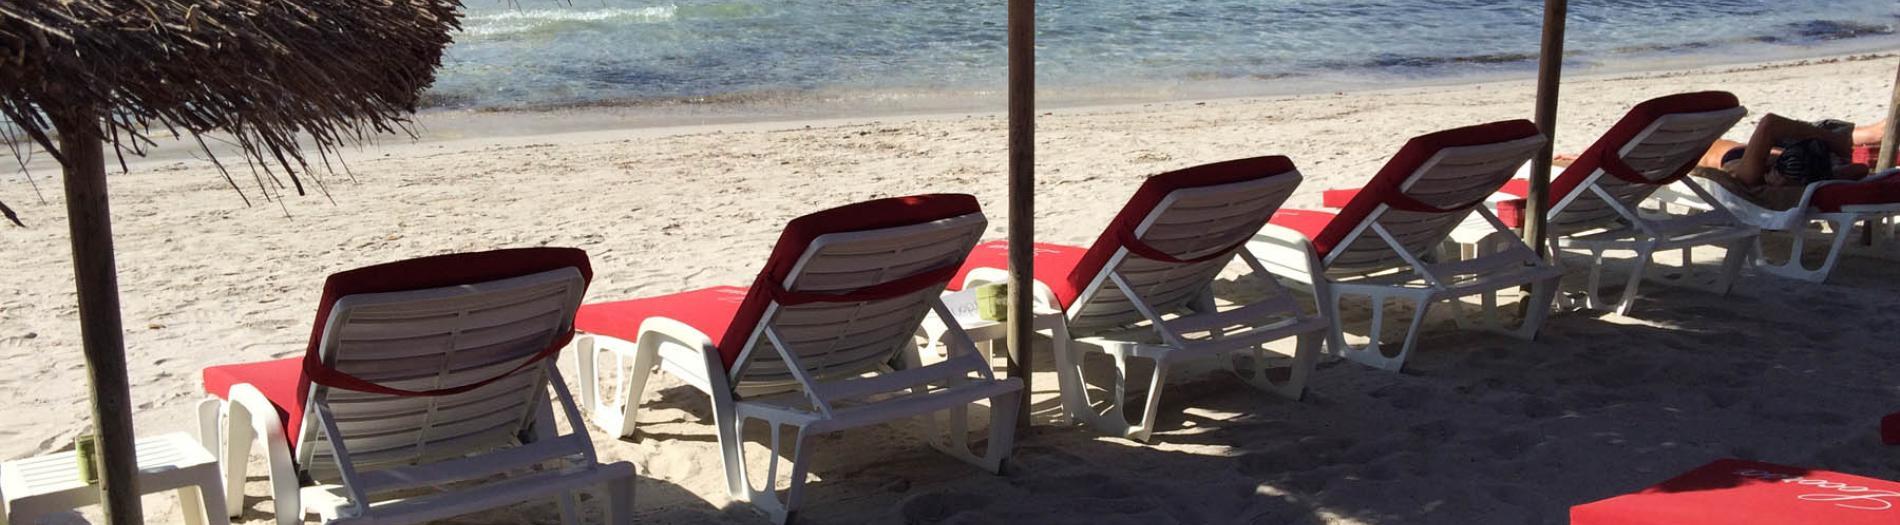 Les Matelas de la plage LOCORSA - Santa Giulia - Corse du sud